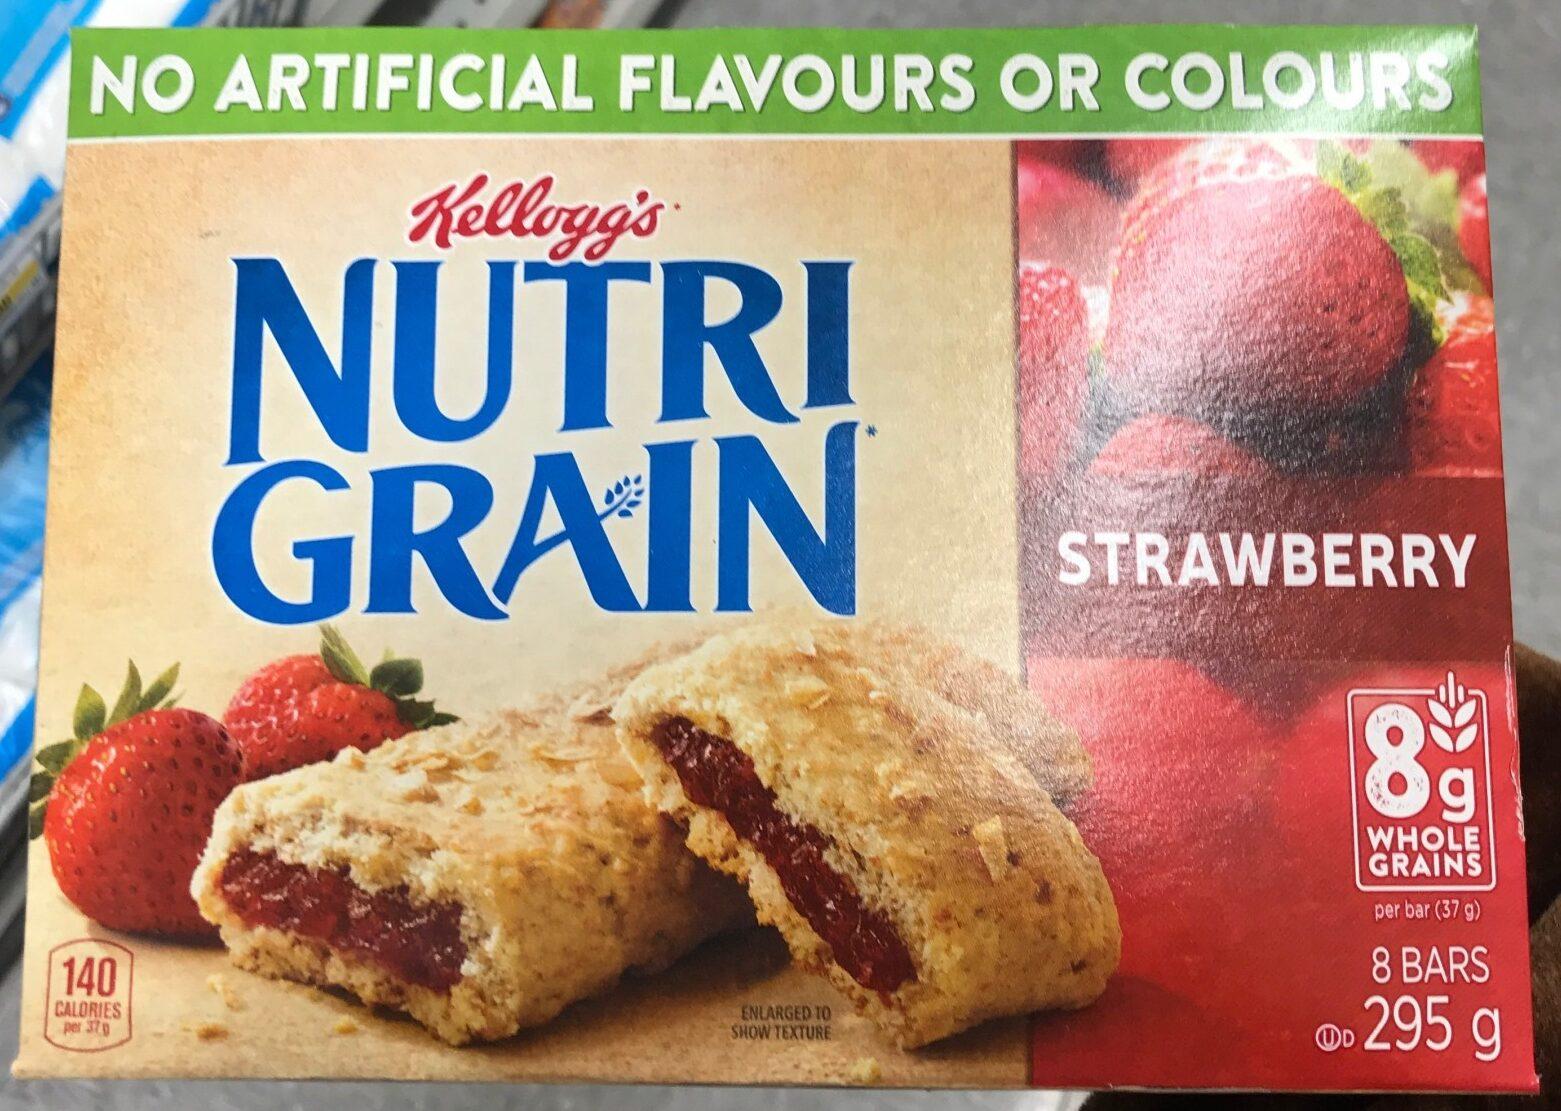 Nutri-grain fraise - Product - fr